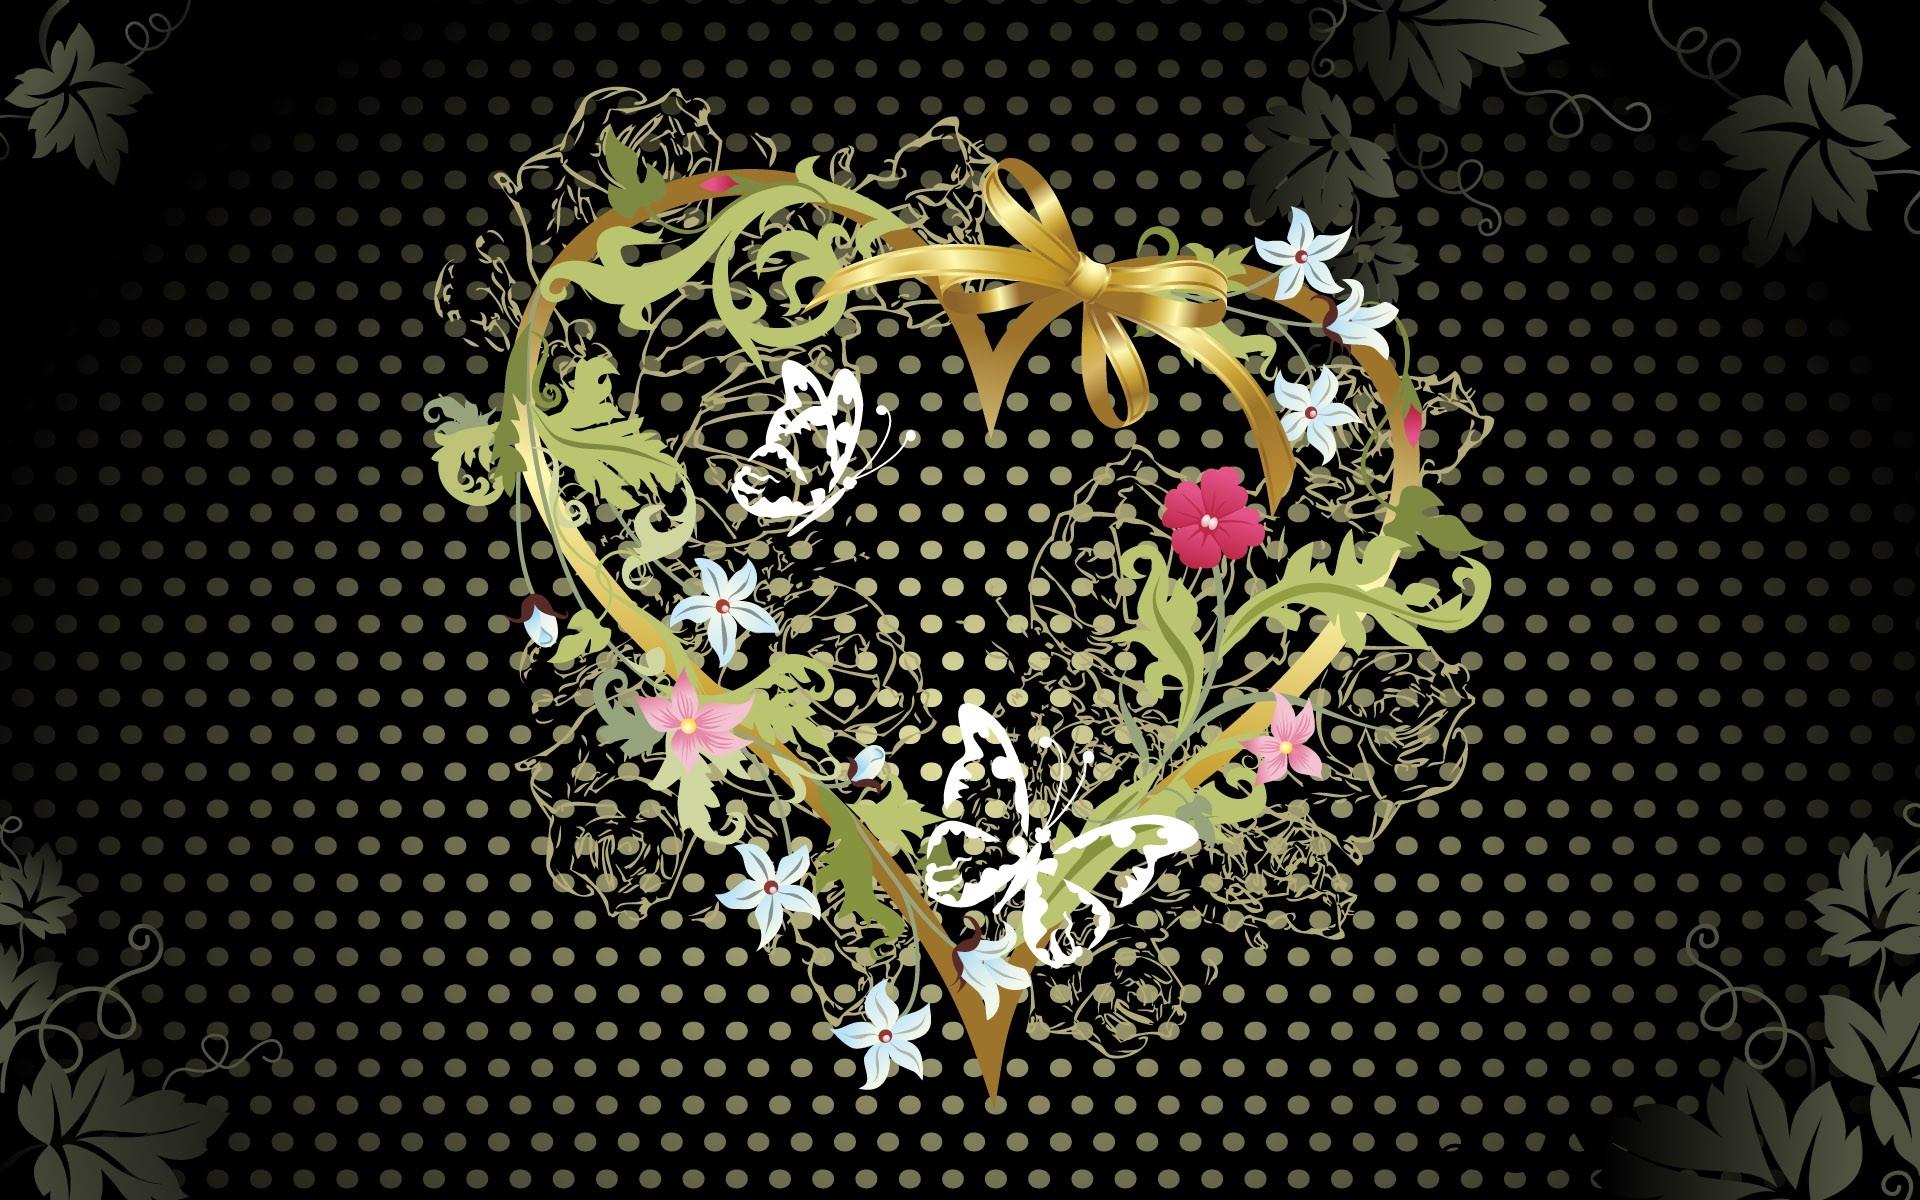 Wallpaper Jantung Bunga Bunga Pola Gelap Terang 1920x1200